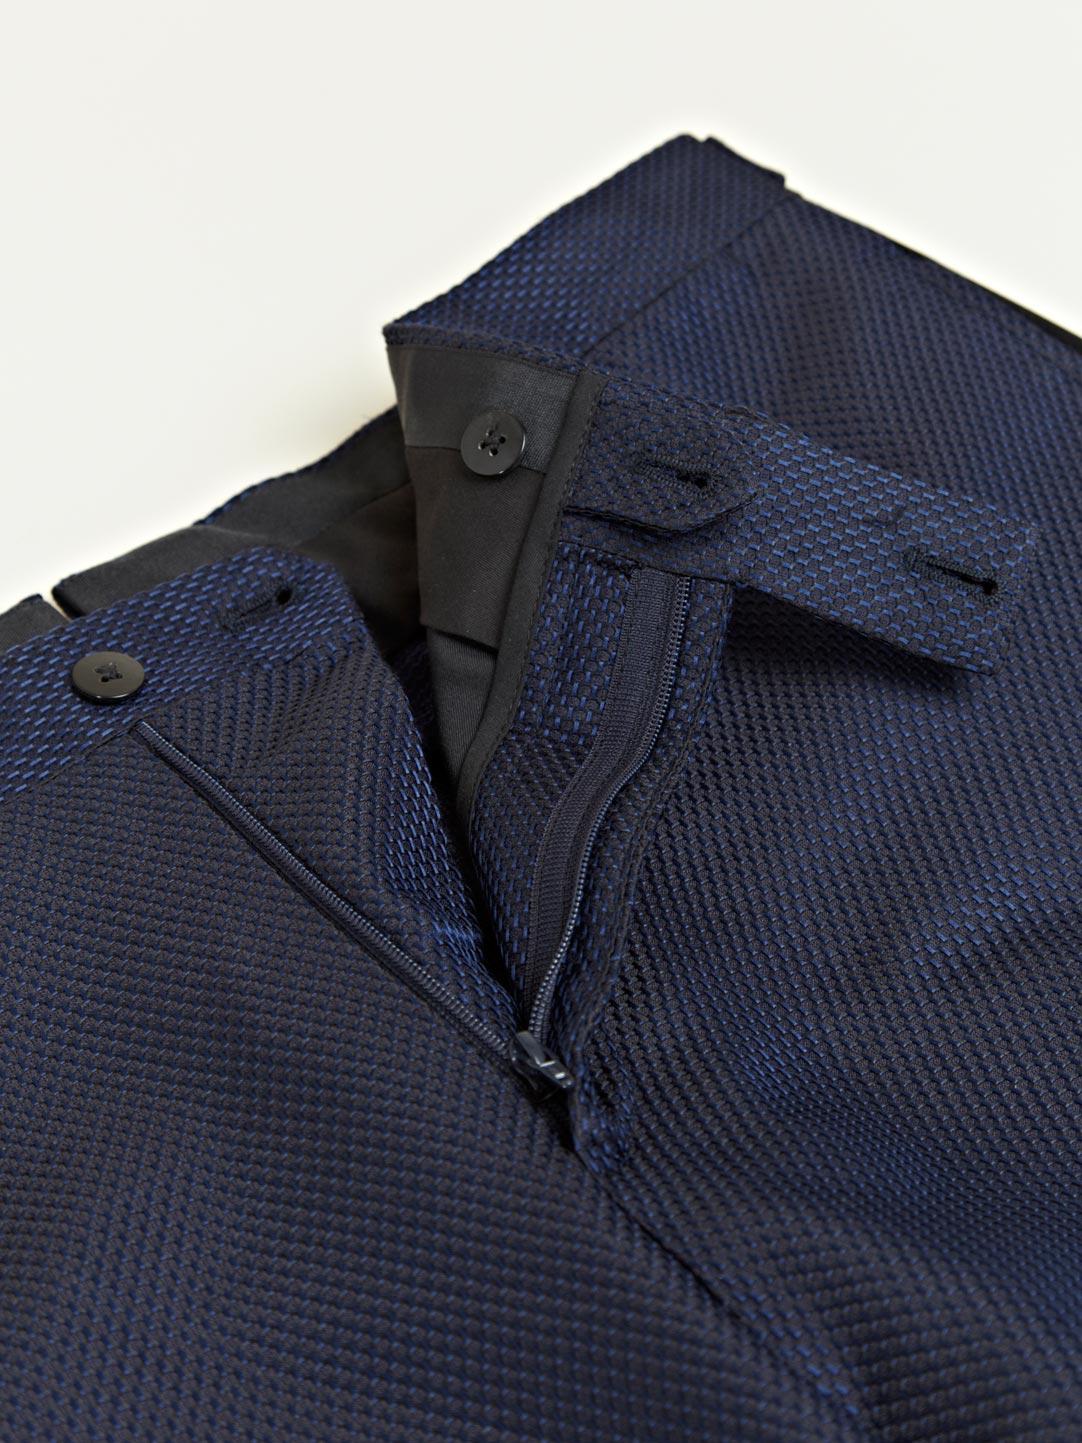 Lanvin Lanvin Mens Satin Strip Trousers in Navy (Blue) for Men